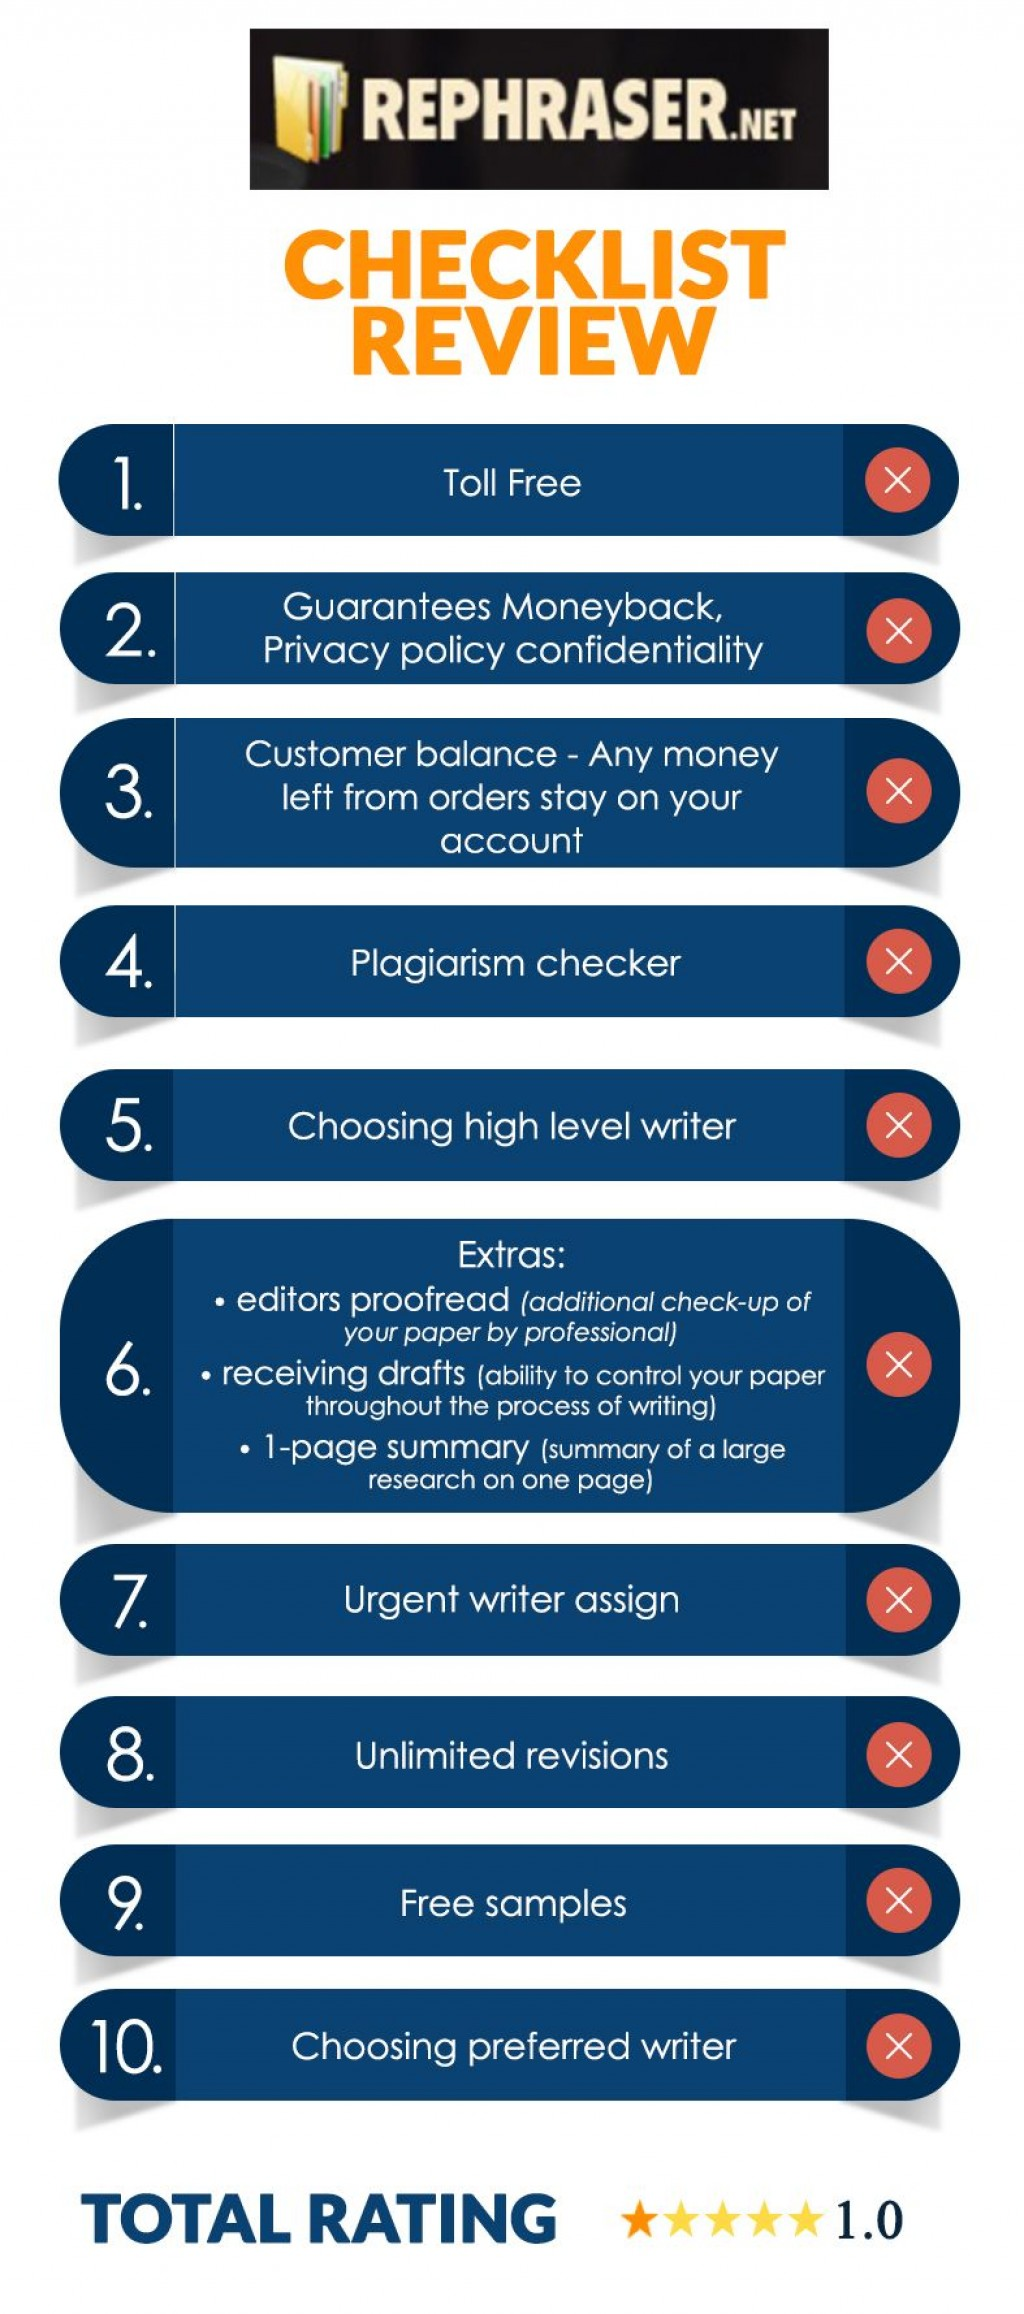 009 Essay Checker Free Online Amazing Sentence Grammar Plagiarism Document Large